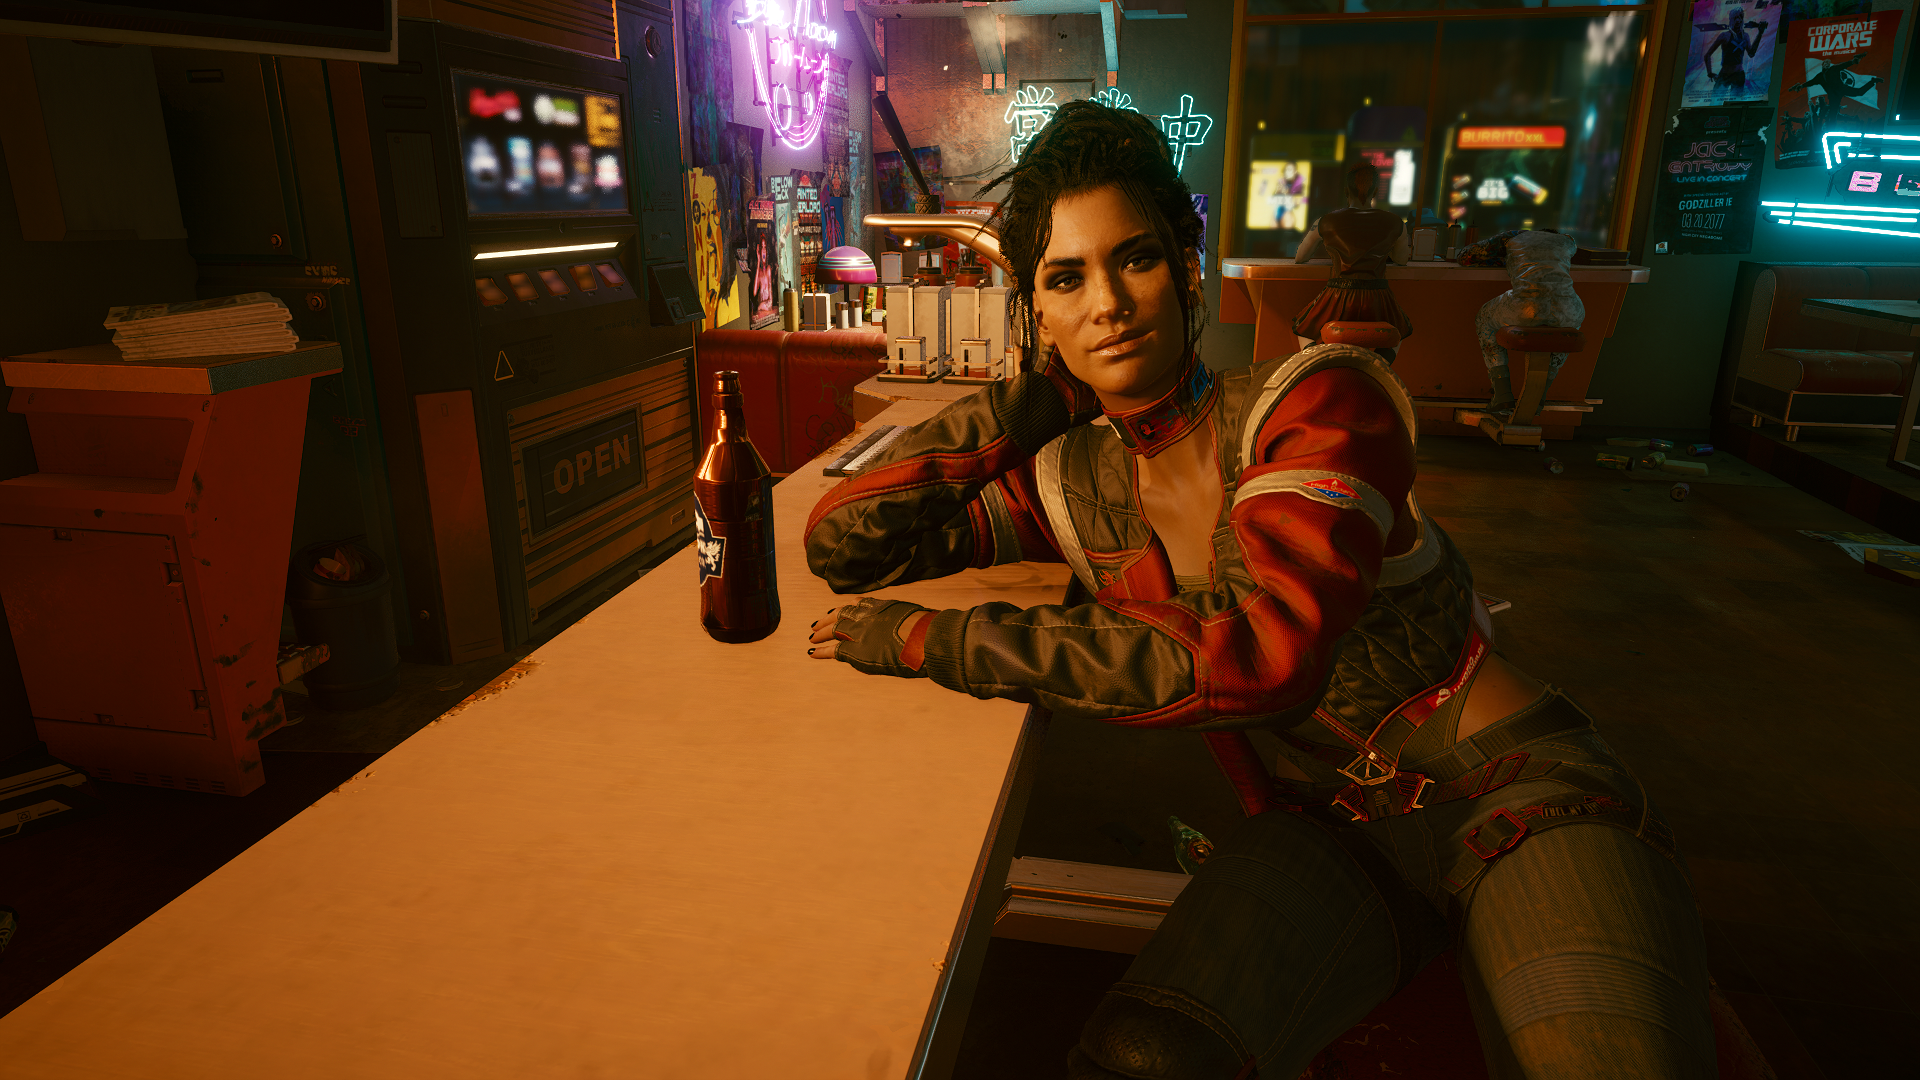 Онлайн Cyberpunk 2077 в Steam упал на 79% спустя месяц после релиза